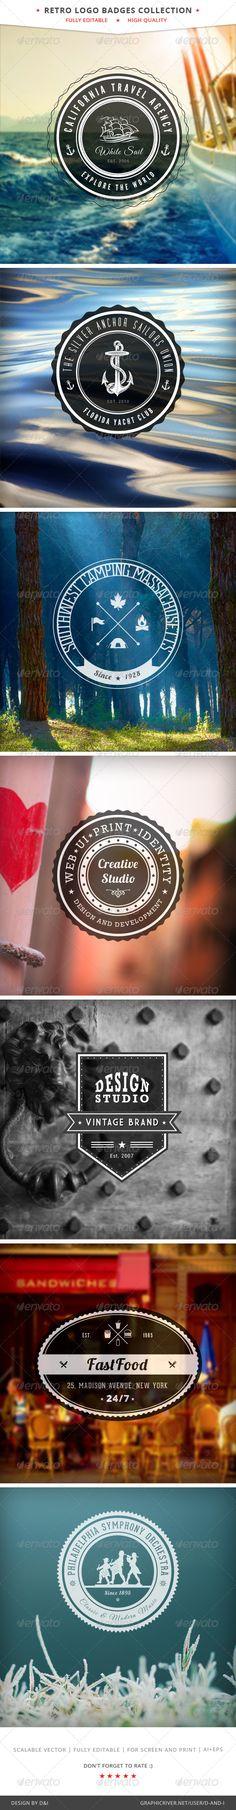 Retro Logo Badges Collection - Vol.1 - GraphicRiver Item for Sale